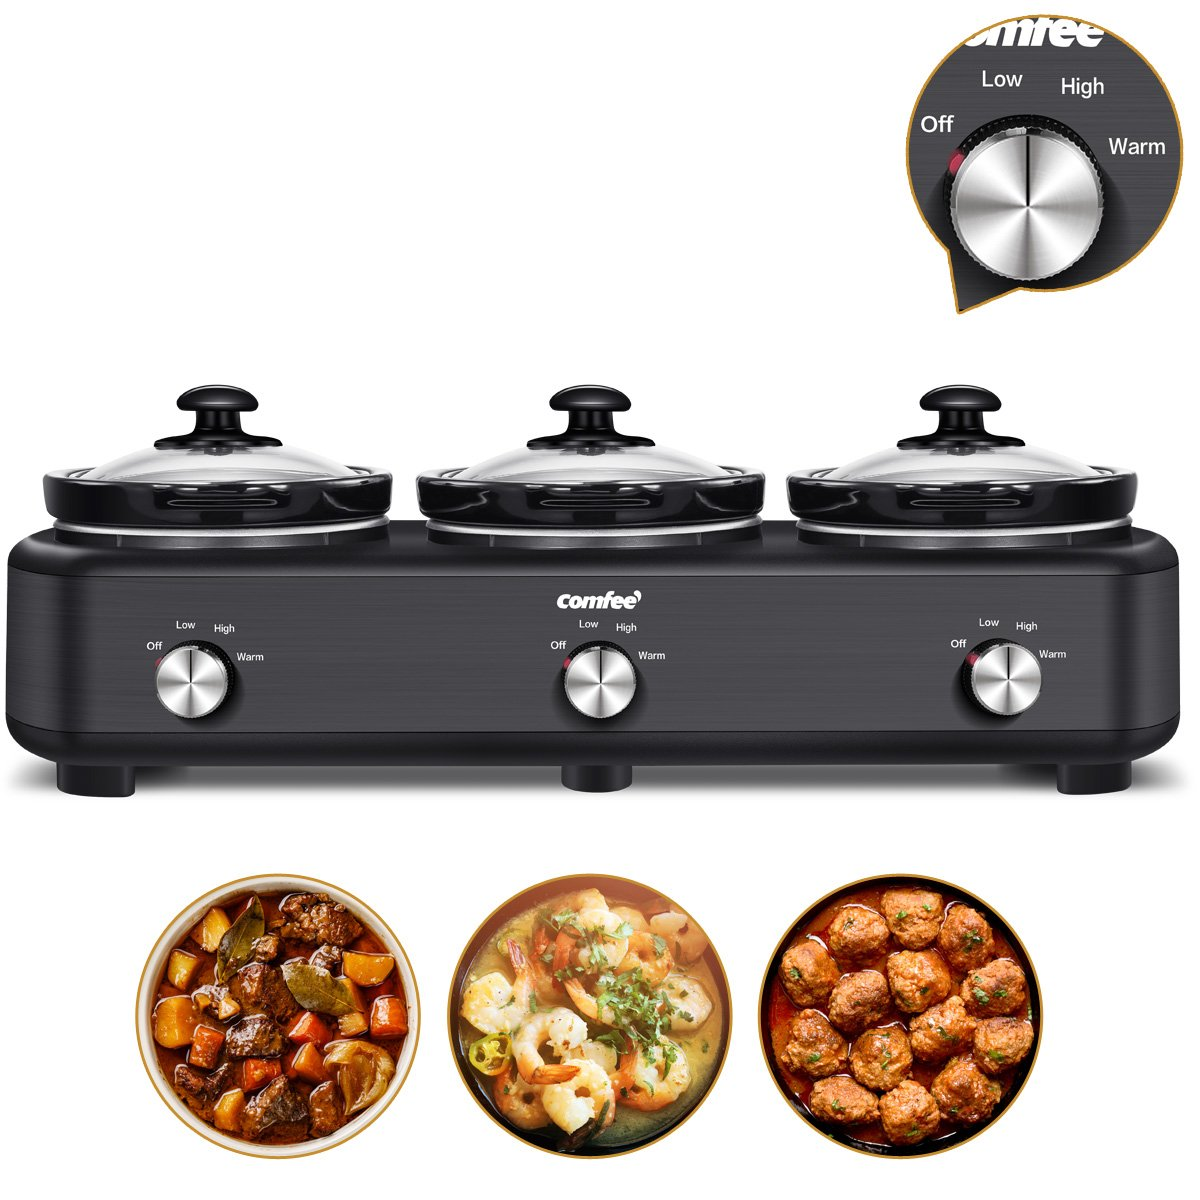 Slow Cooker Crock Pot,Triple Crock Pot Buffet Server,Temperature Setting and 3 * 1.5 Quart Removable Ceramic Pot, Dishwasher Safe by Comfee